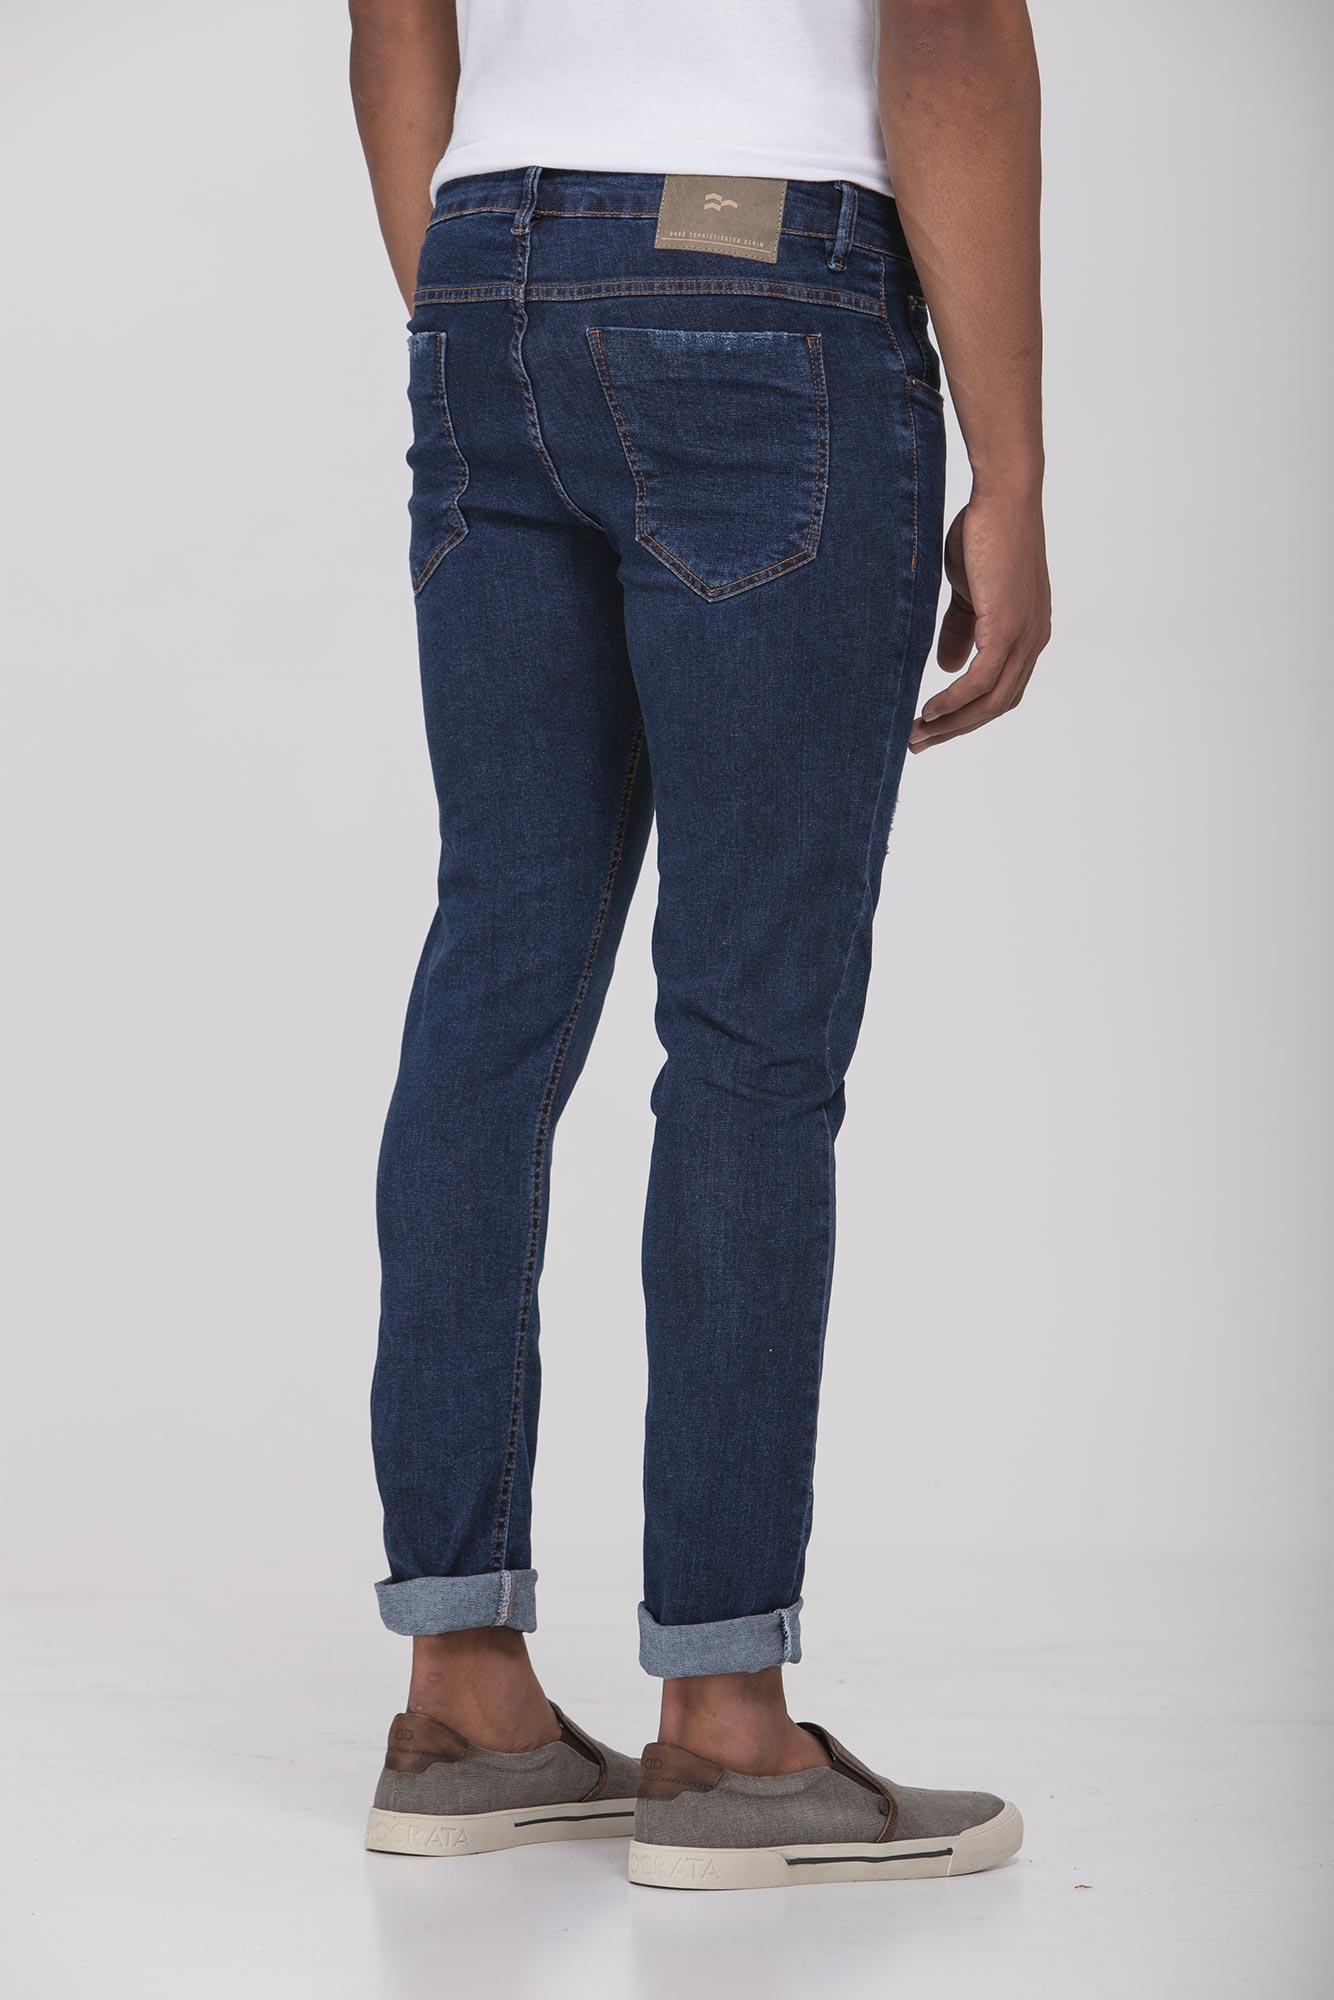 Calça Jeans Soft Mint